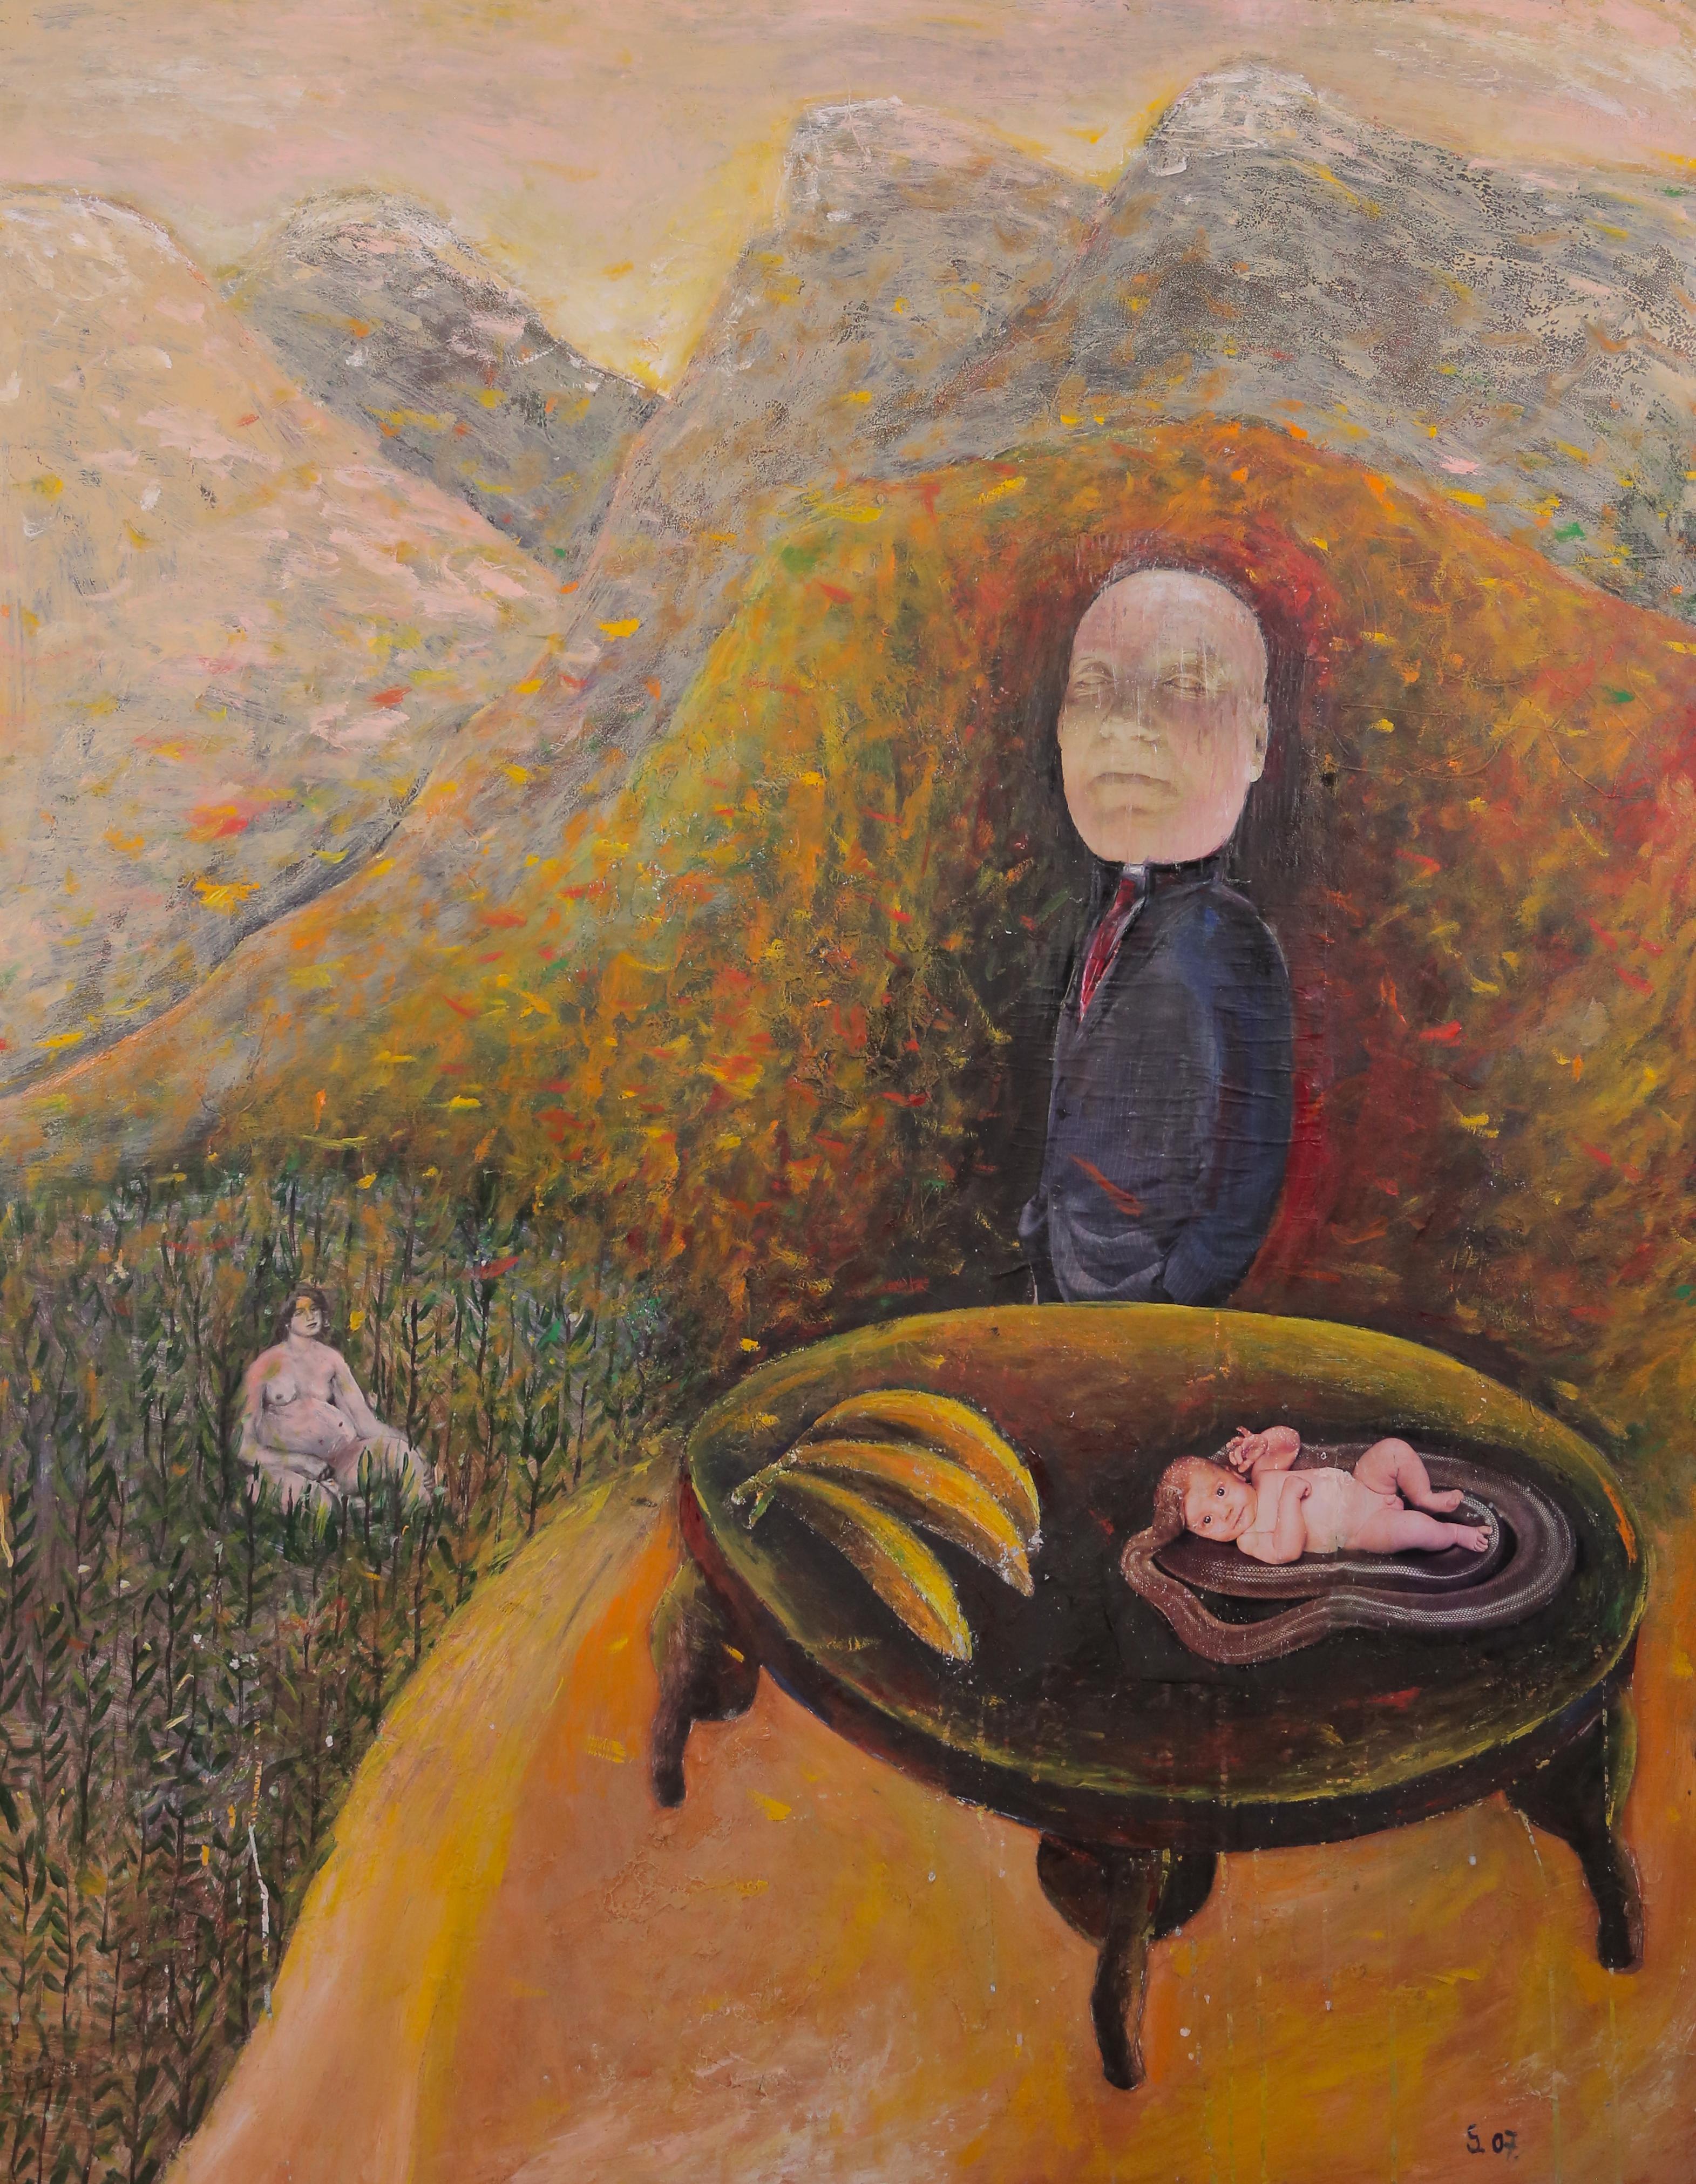 My Mother's Lover, Szilard Szilagyi, Figurative Oil Painting, Surrealist, Yellow